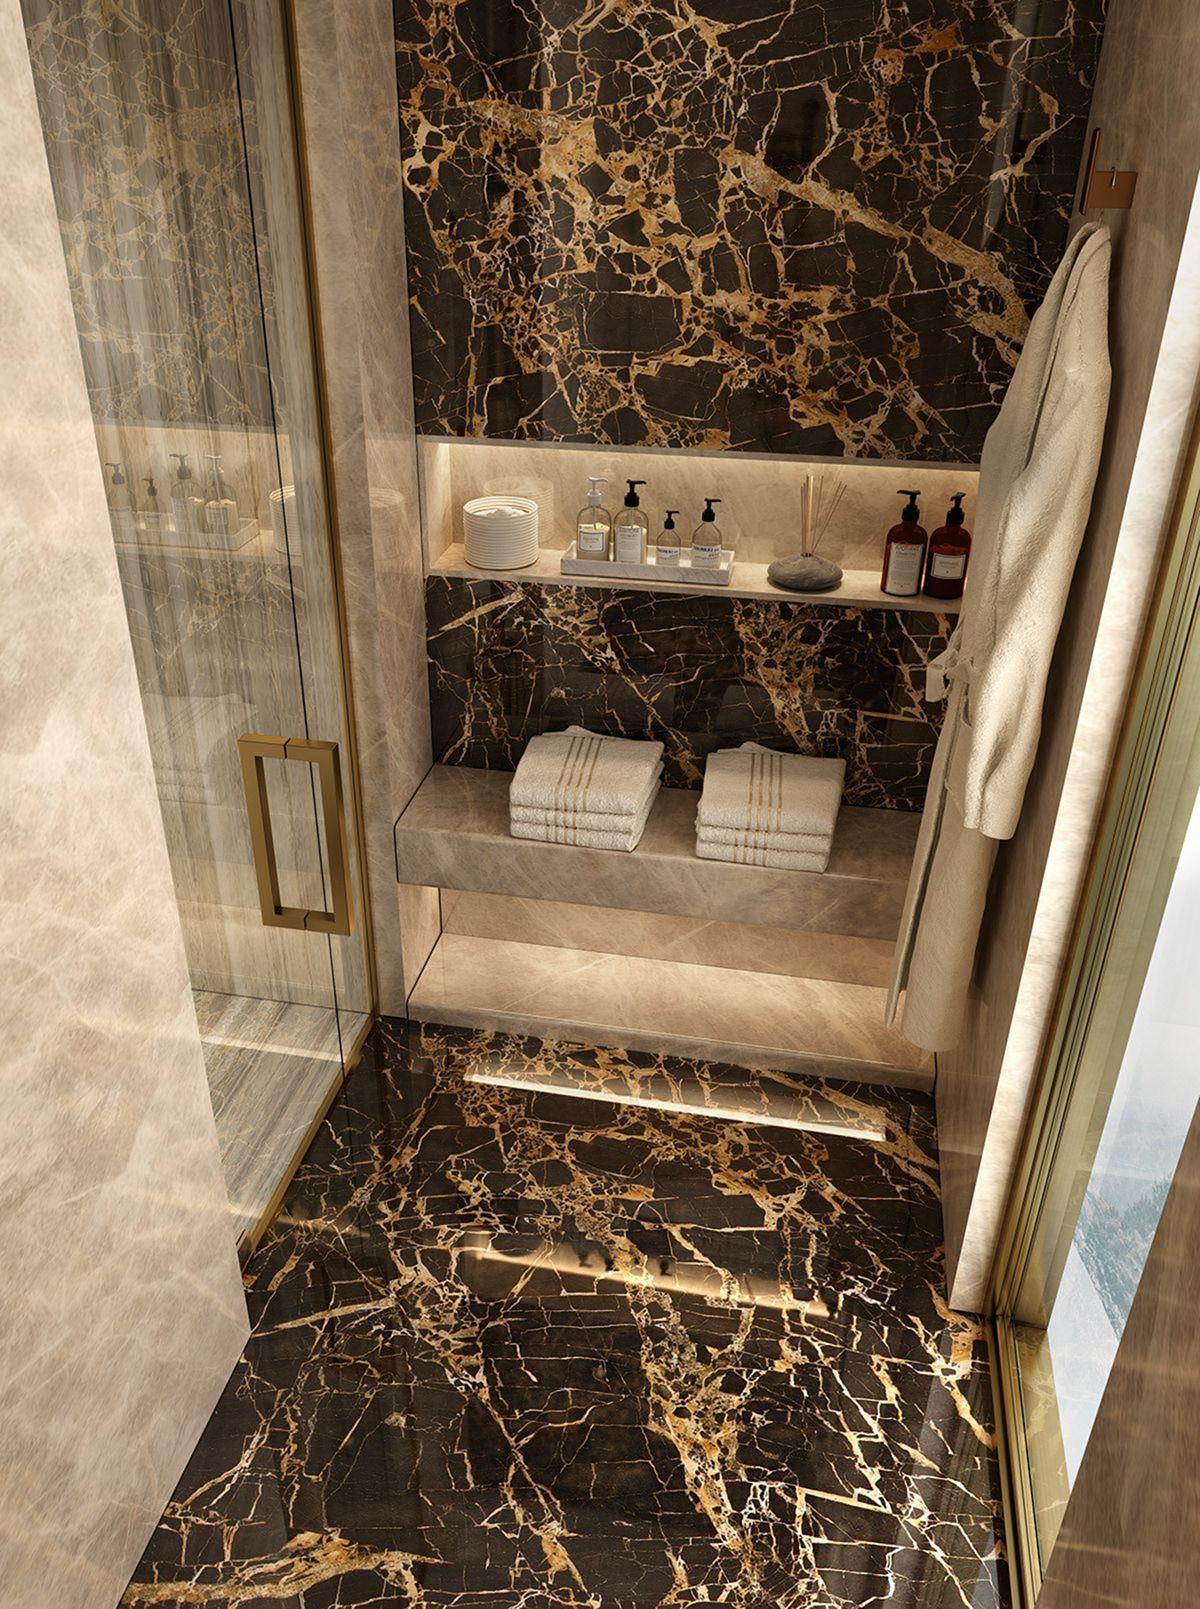 Photo of 20 Enchanting Luxurious Bathroom Decorating Ideas For More Feeling Comfort When Take a Bath – Decor & Gardening Ideas